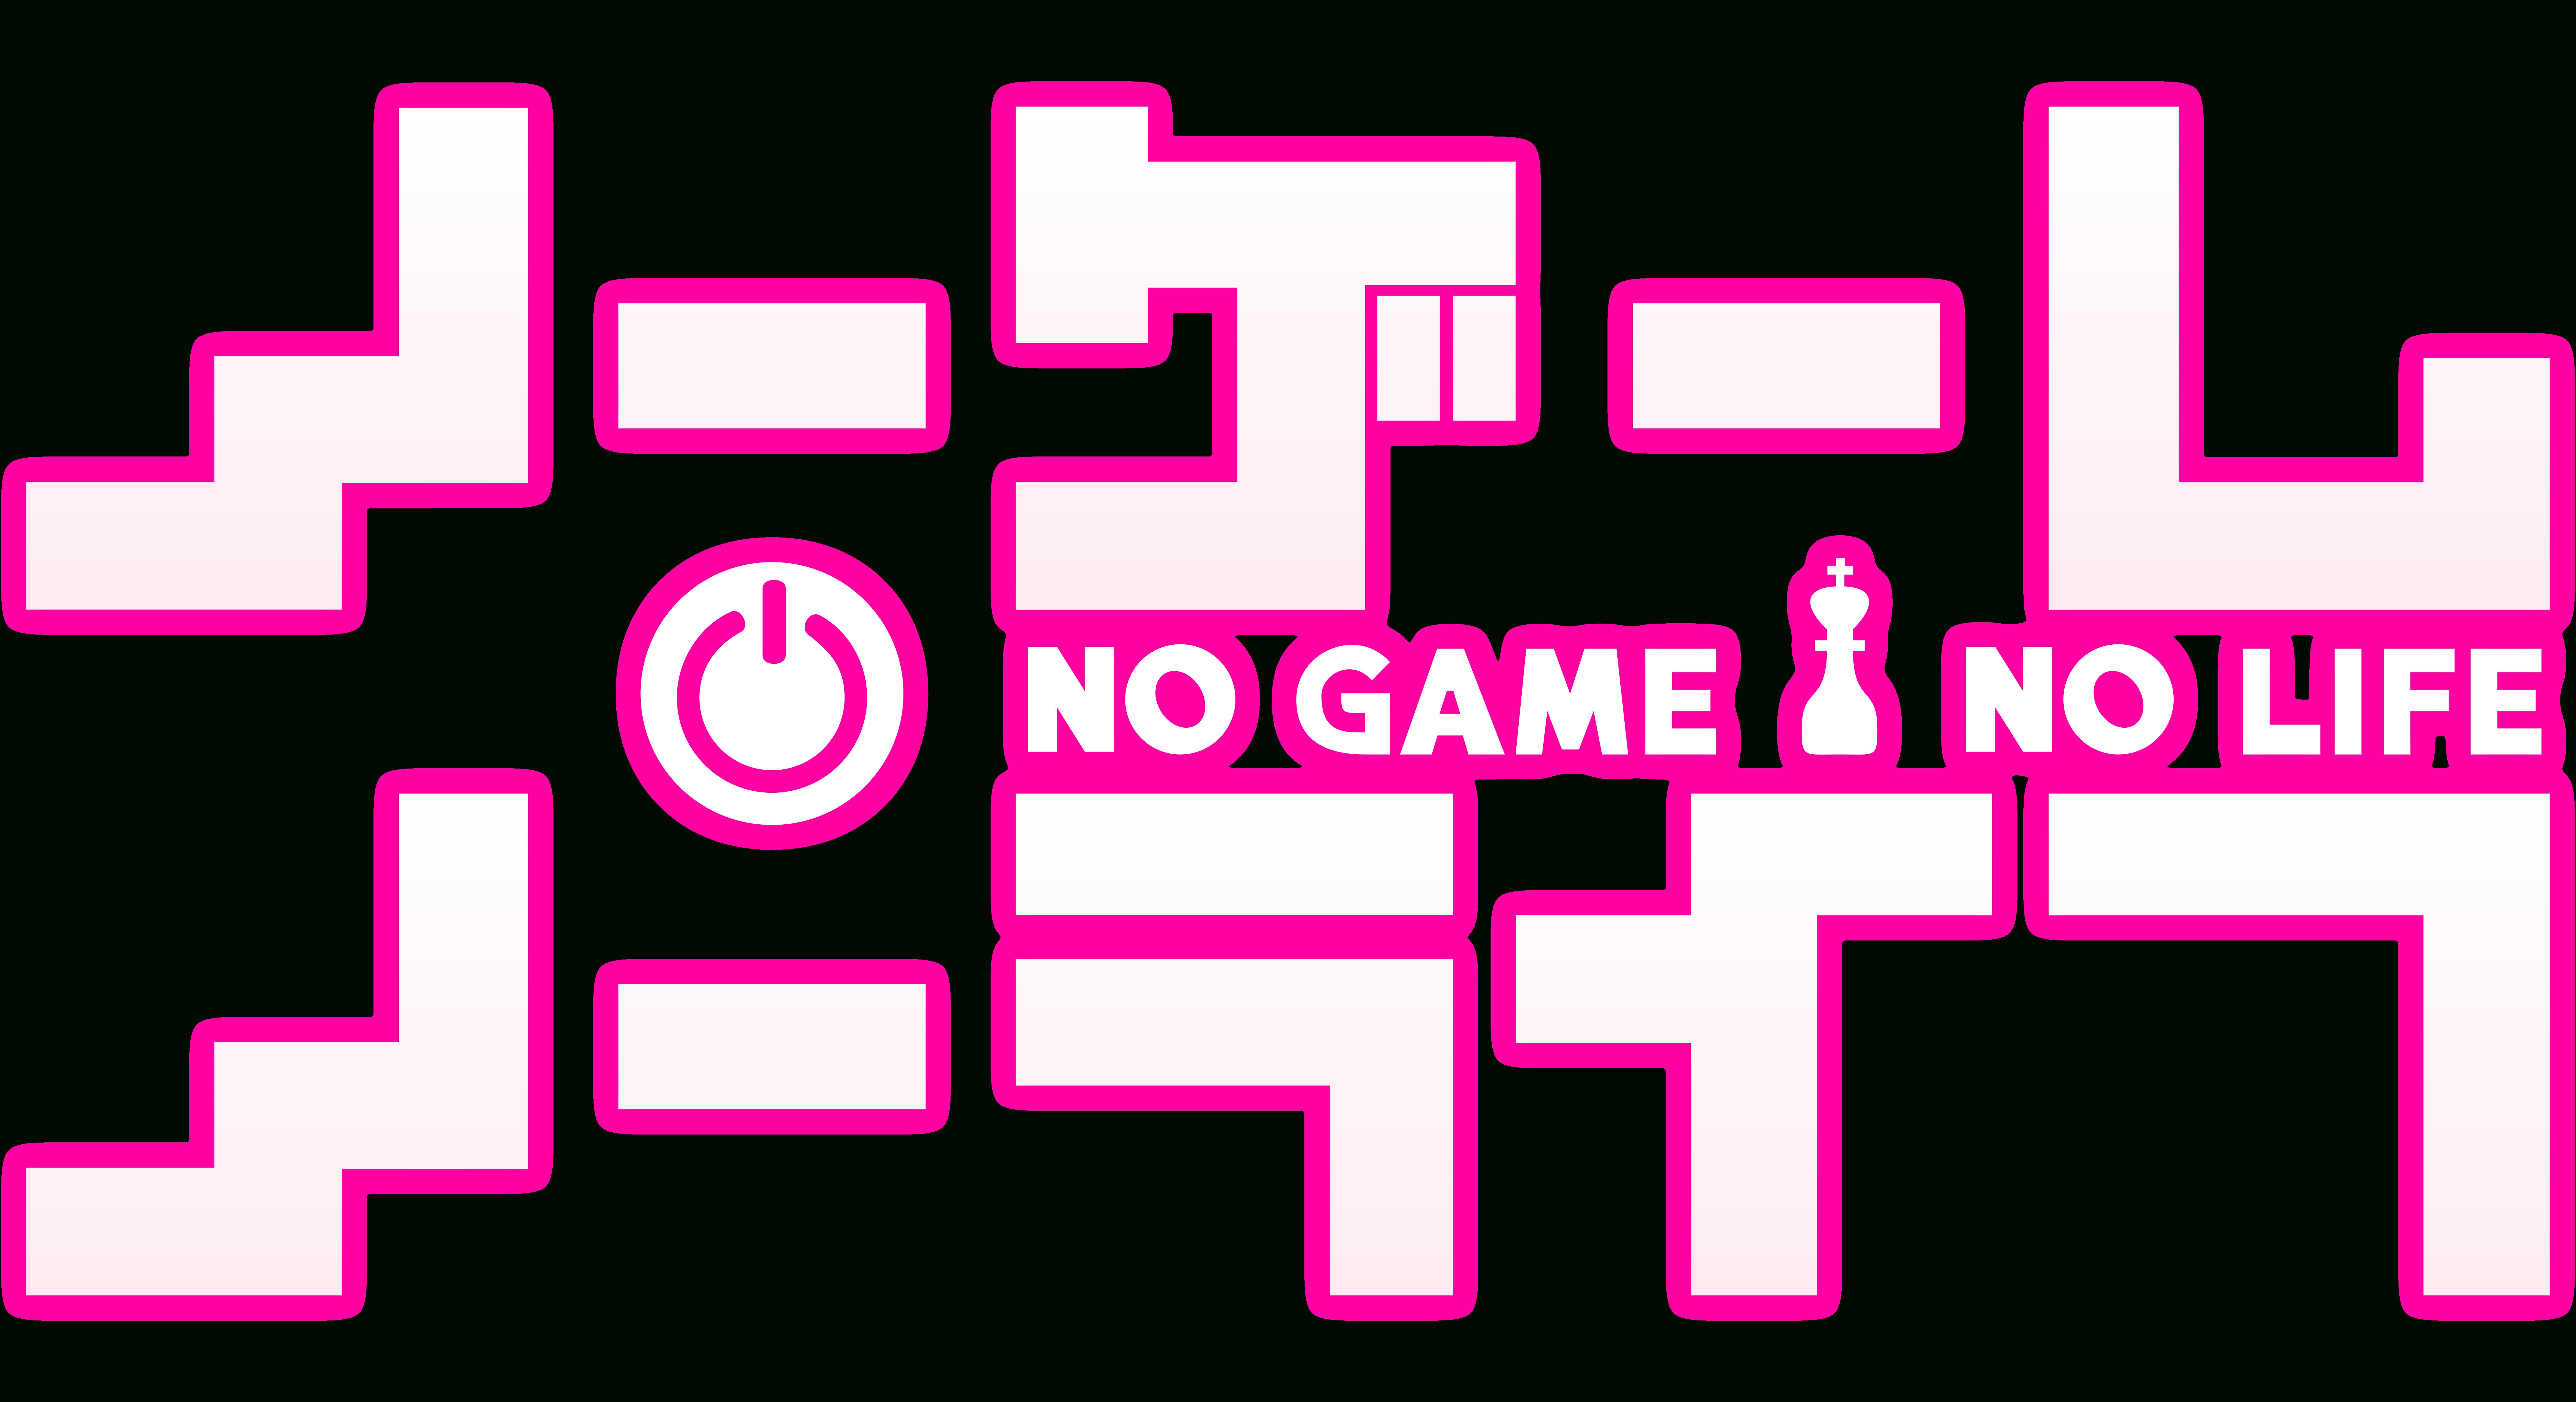 no game no life 8k ultra hd wallpaper | hintergrund | 9187x5000 | id